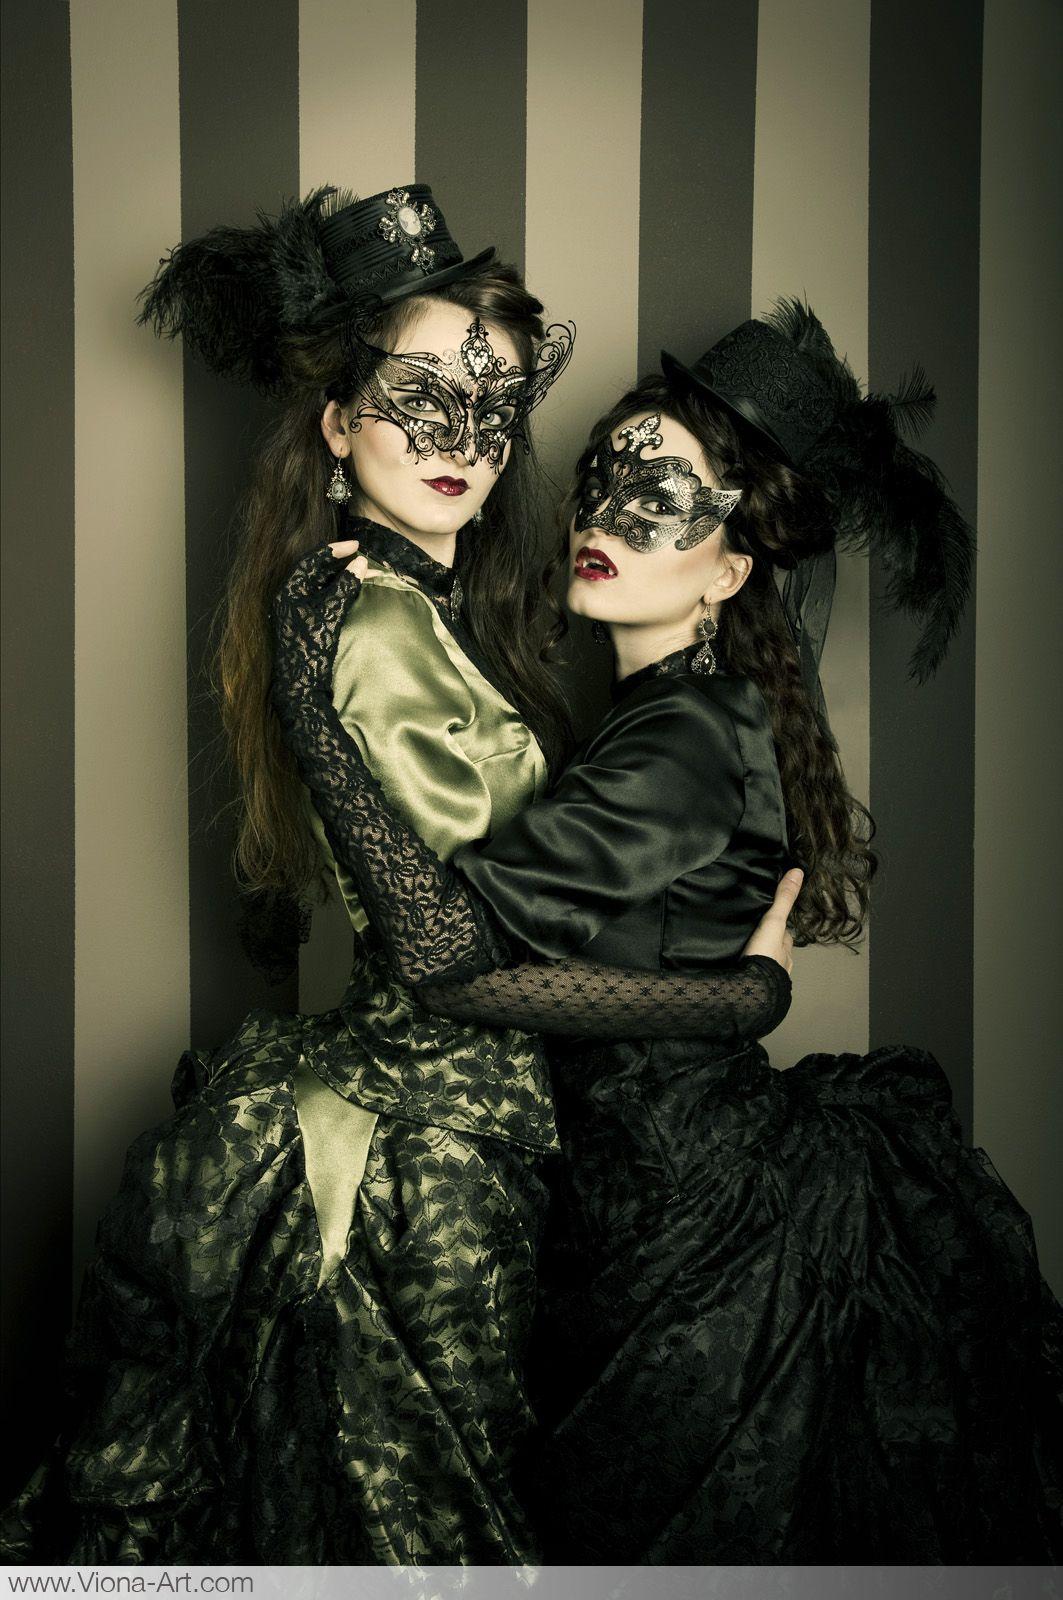 Bloodsisters Love Masks Masked Ball Dark Dress